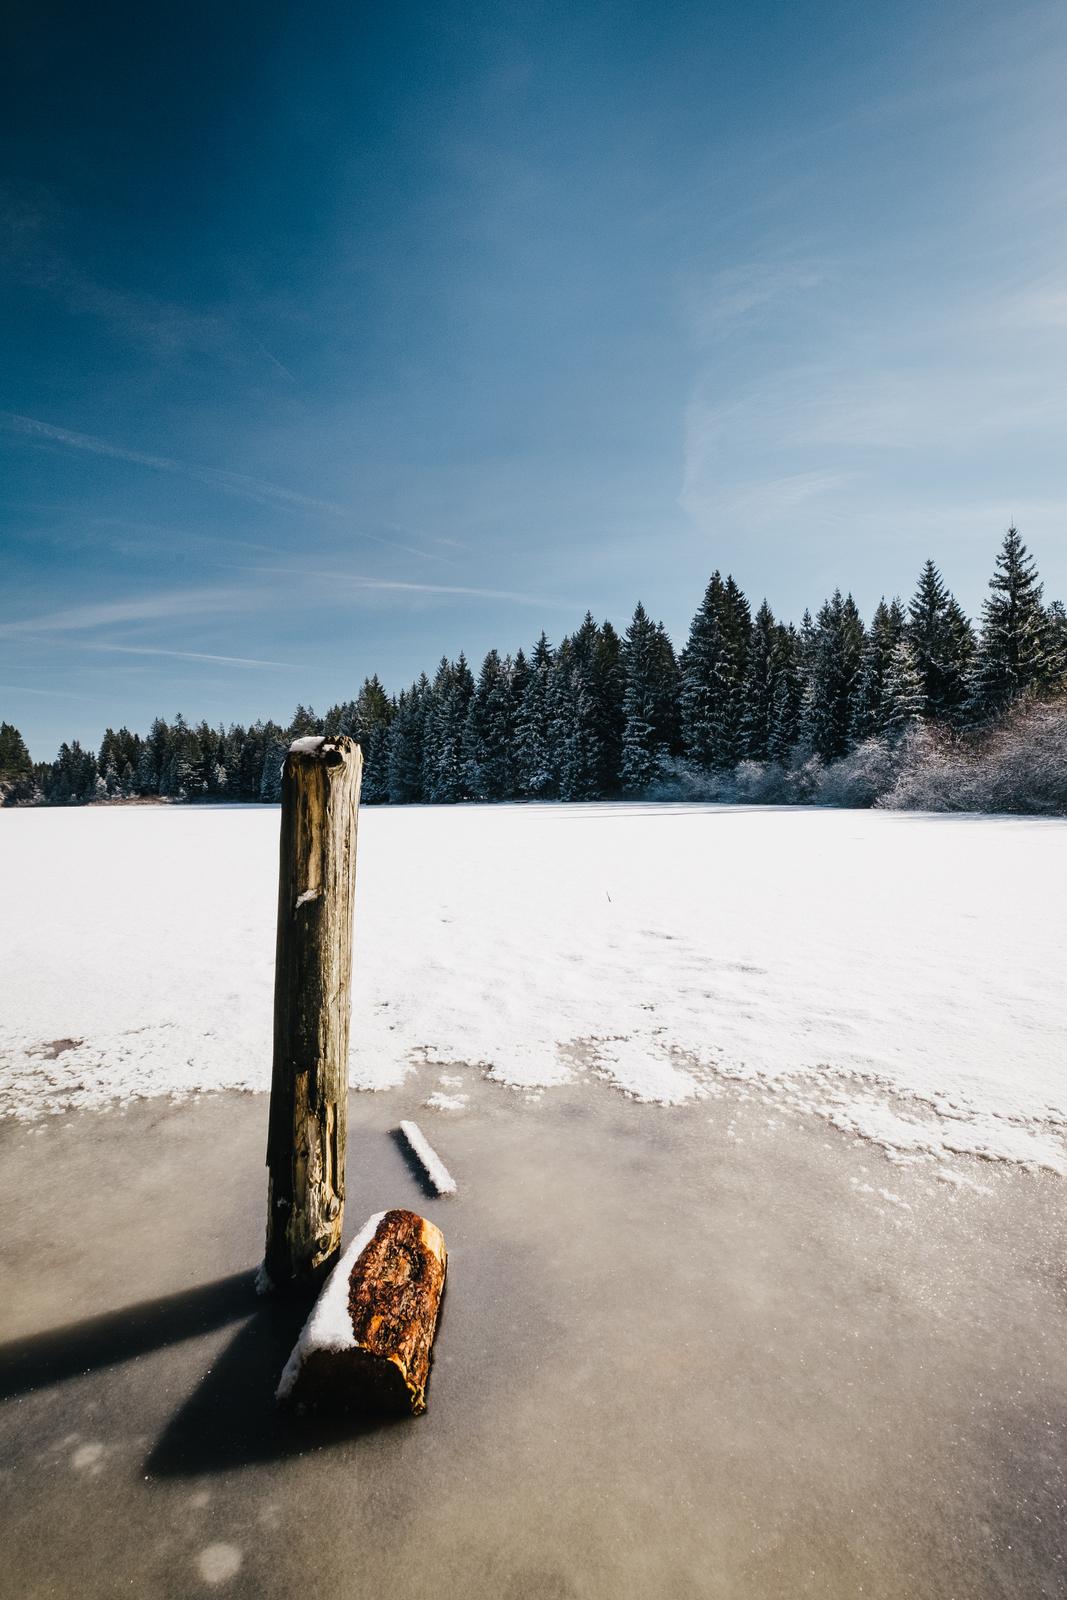 Itinéraire Suisse 1 semaine – Jura suisse & canton de Soleure